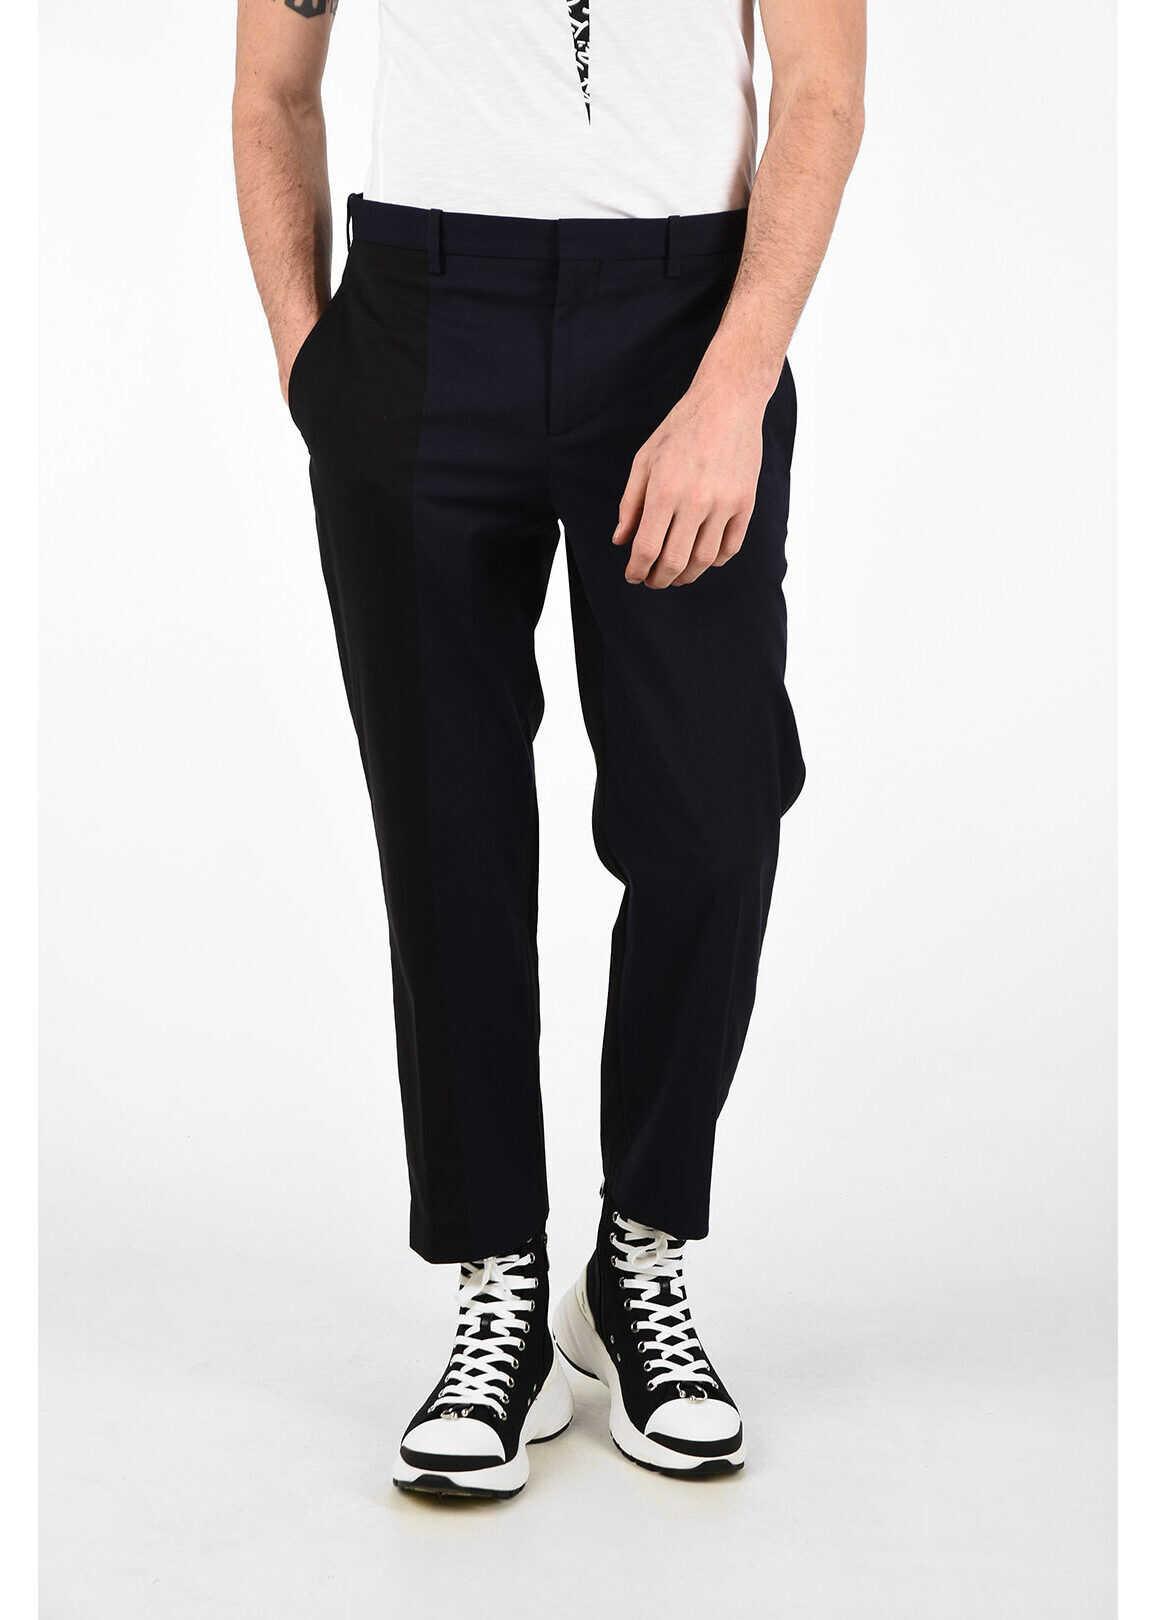 Neil Barrett Slim Fit BI-COLOUR Pants with Hidden Closure BLUE imagine